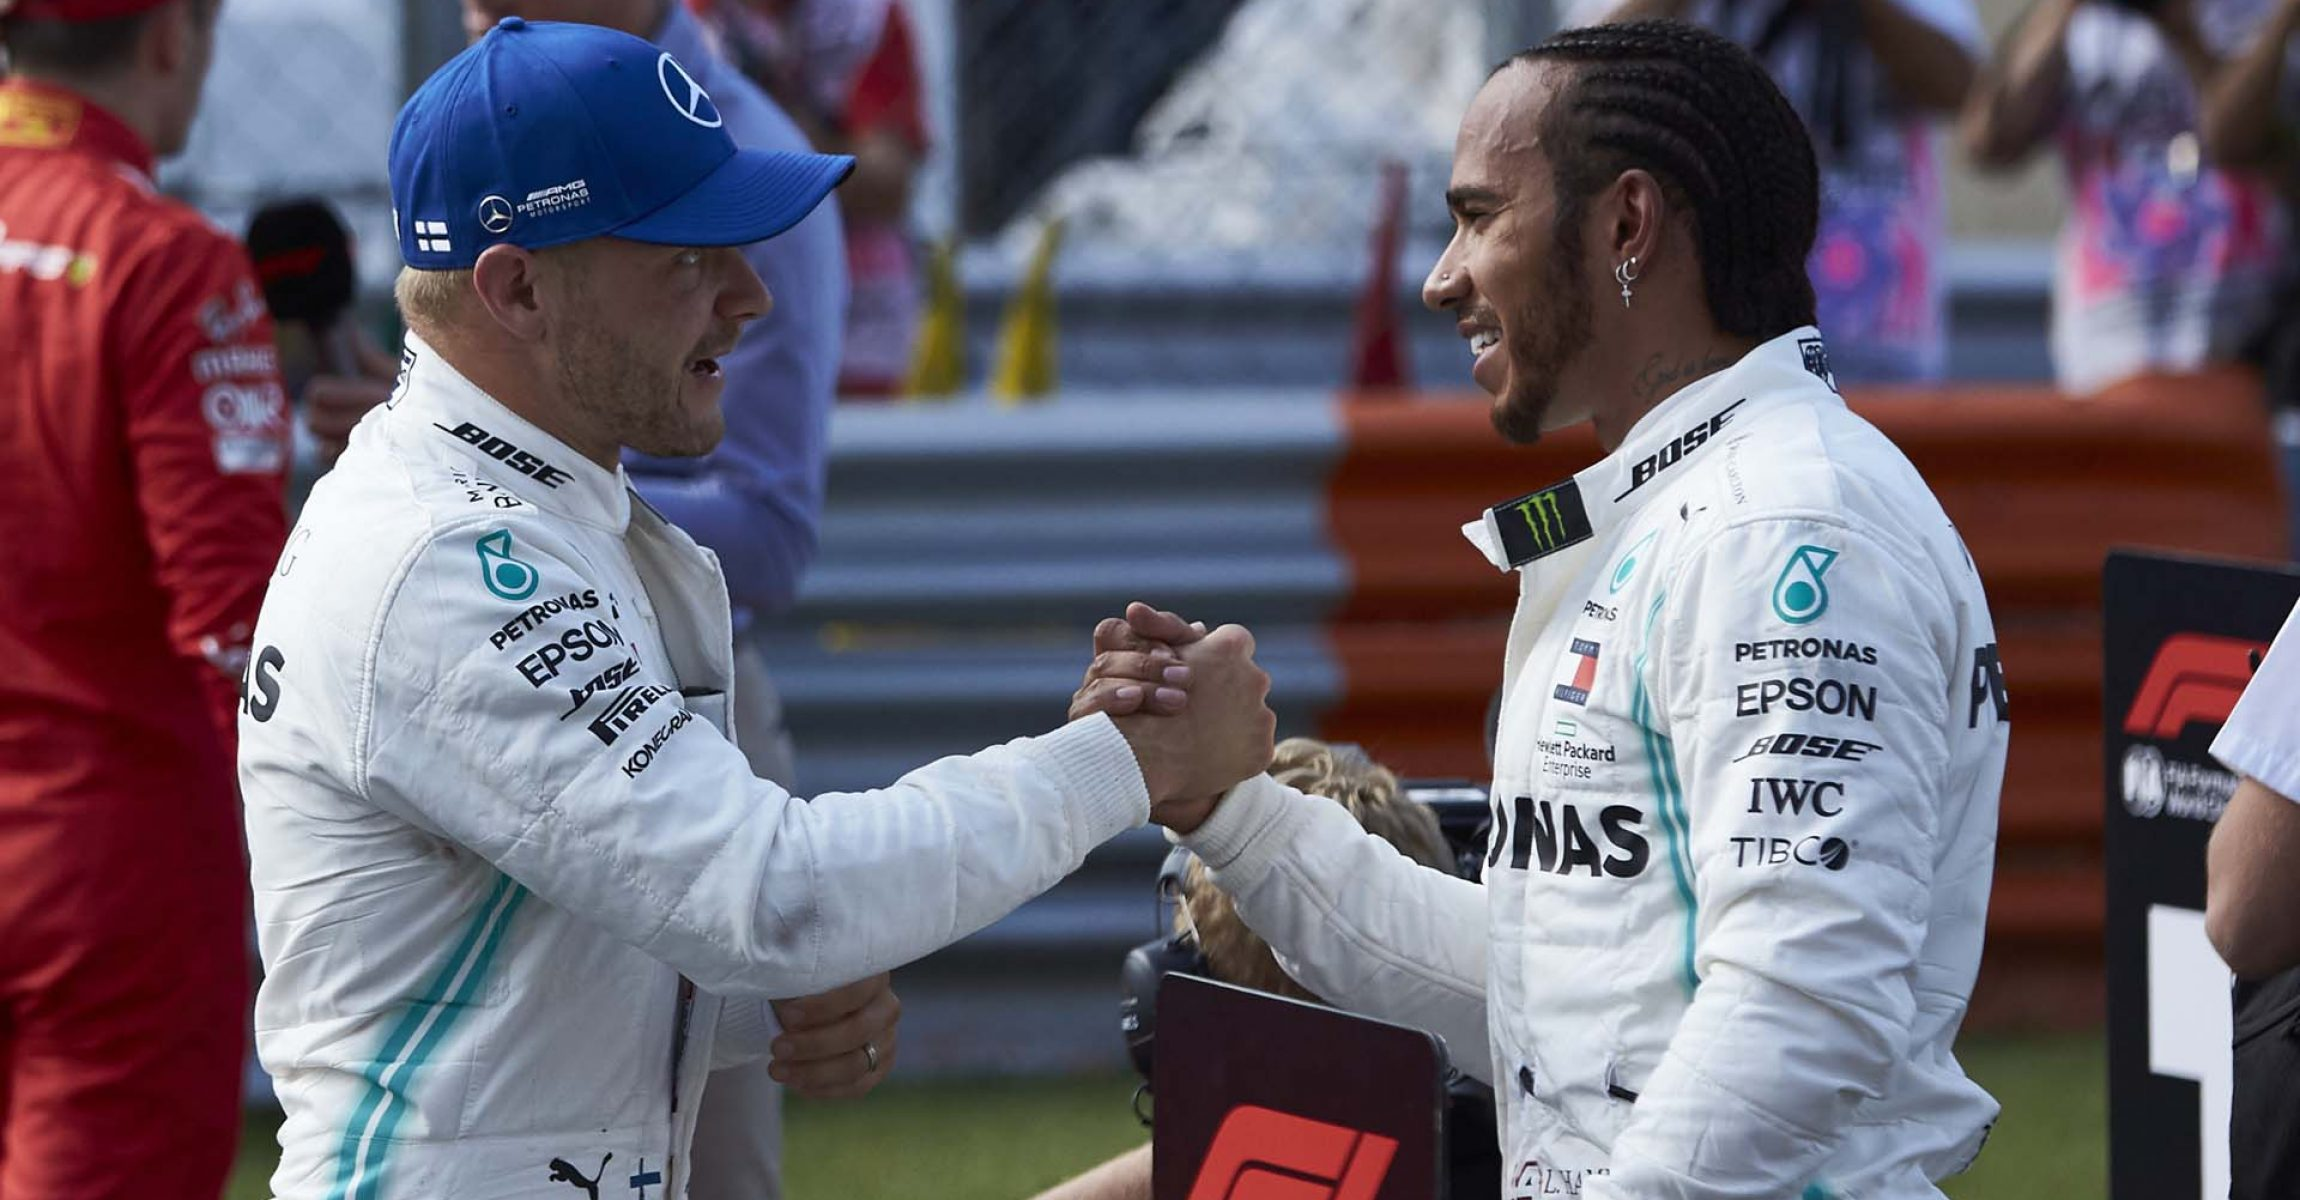 2019 Italian Grand Prix, Saturday - Steve Etherington Lewis Hamilton Valtteri Bottas Mercedes